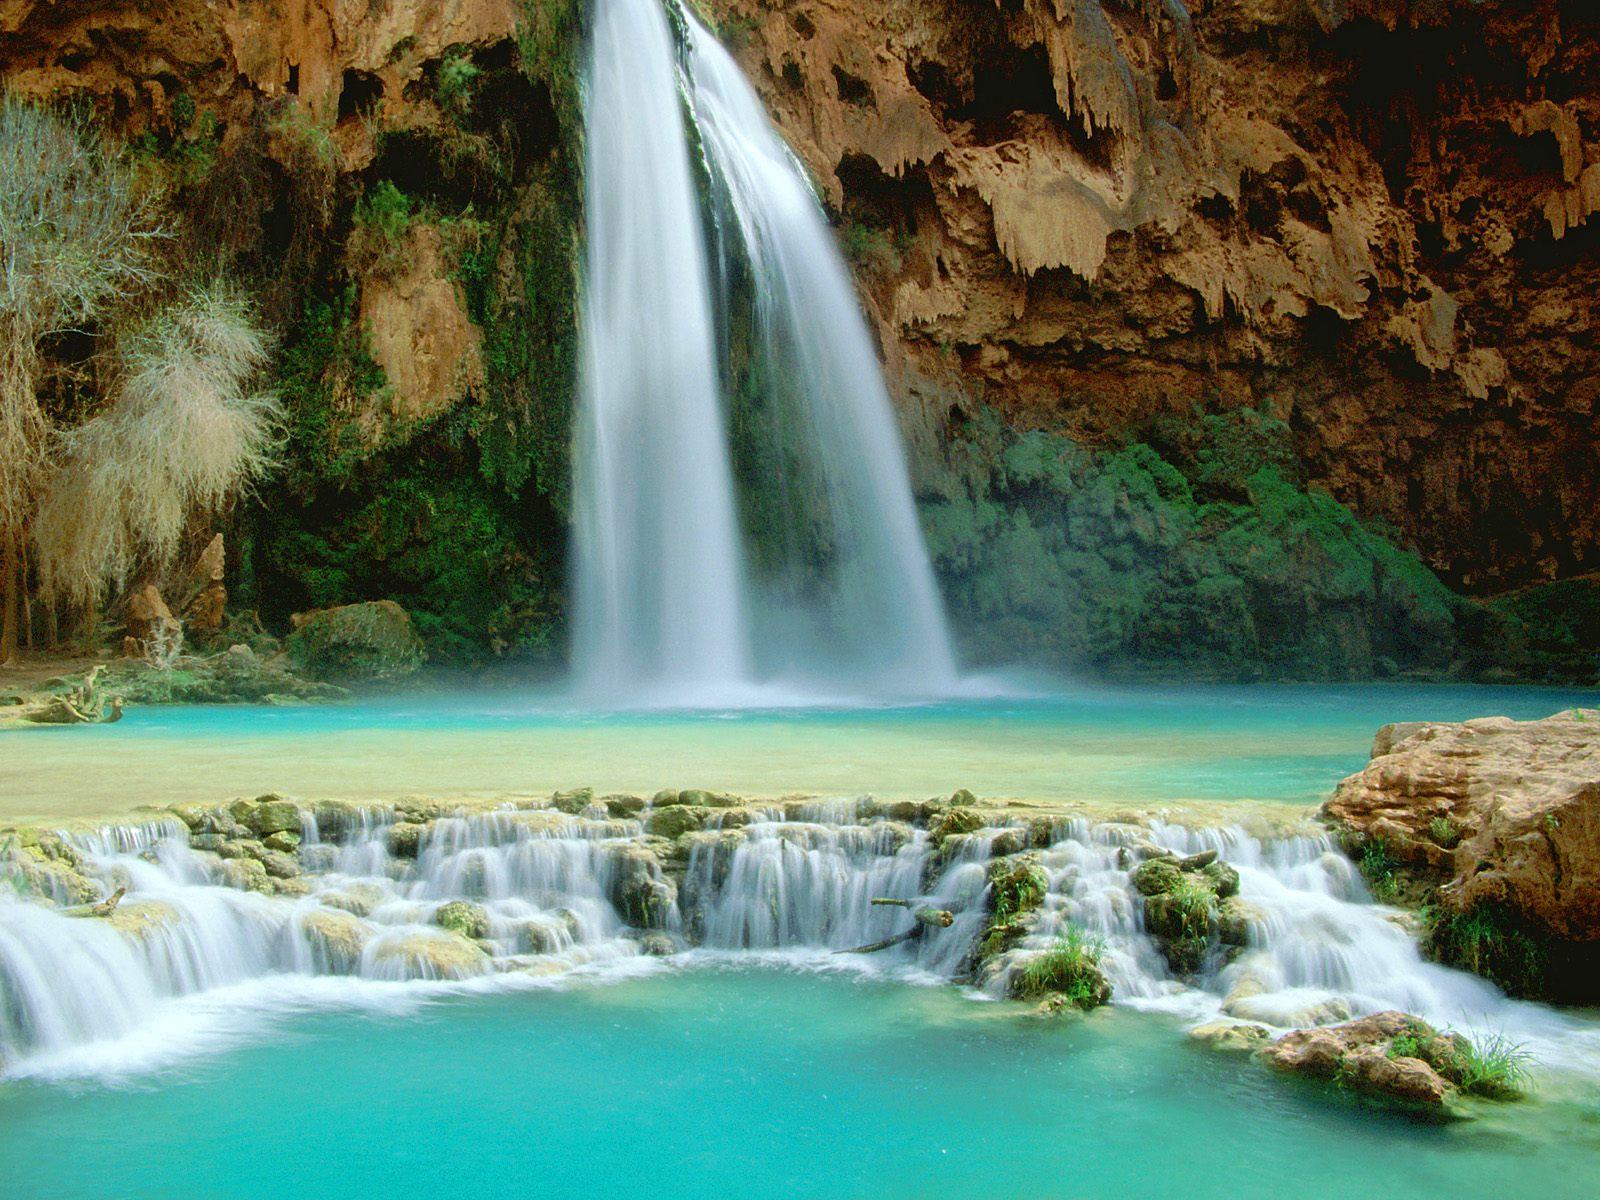 Waterfall Wallpapers HD: Beautiful Waterfall Wallpapers HD